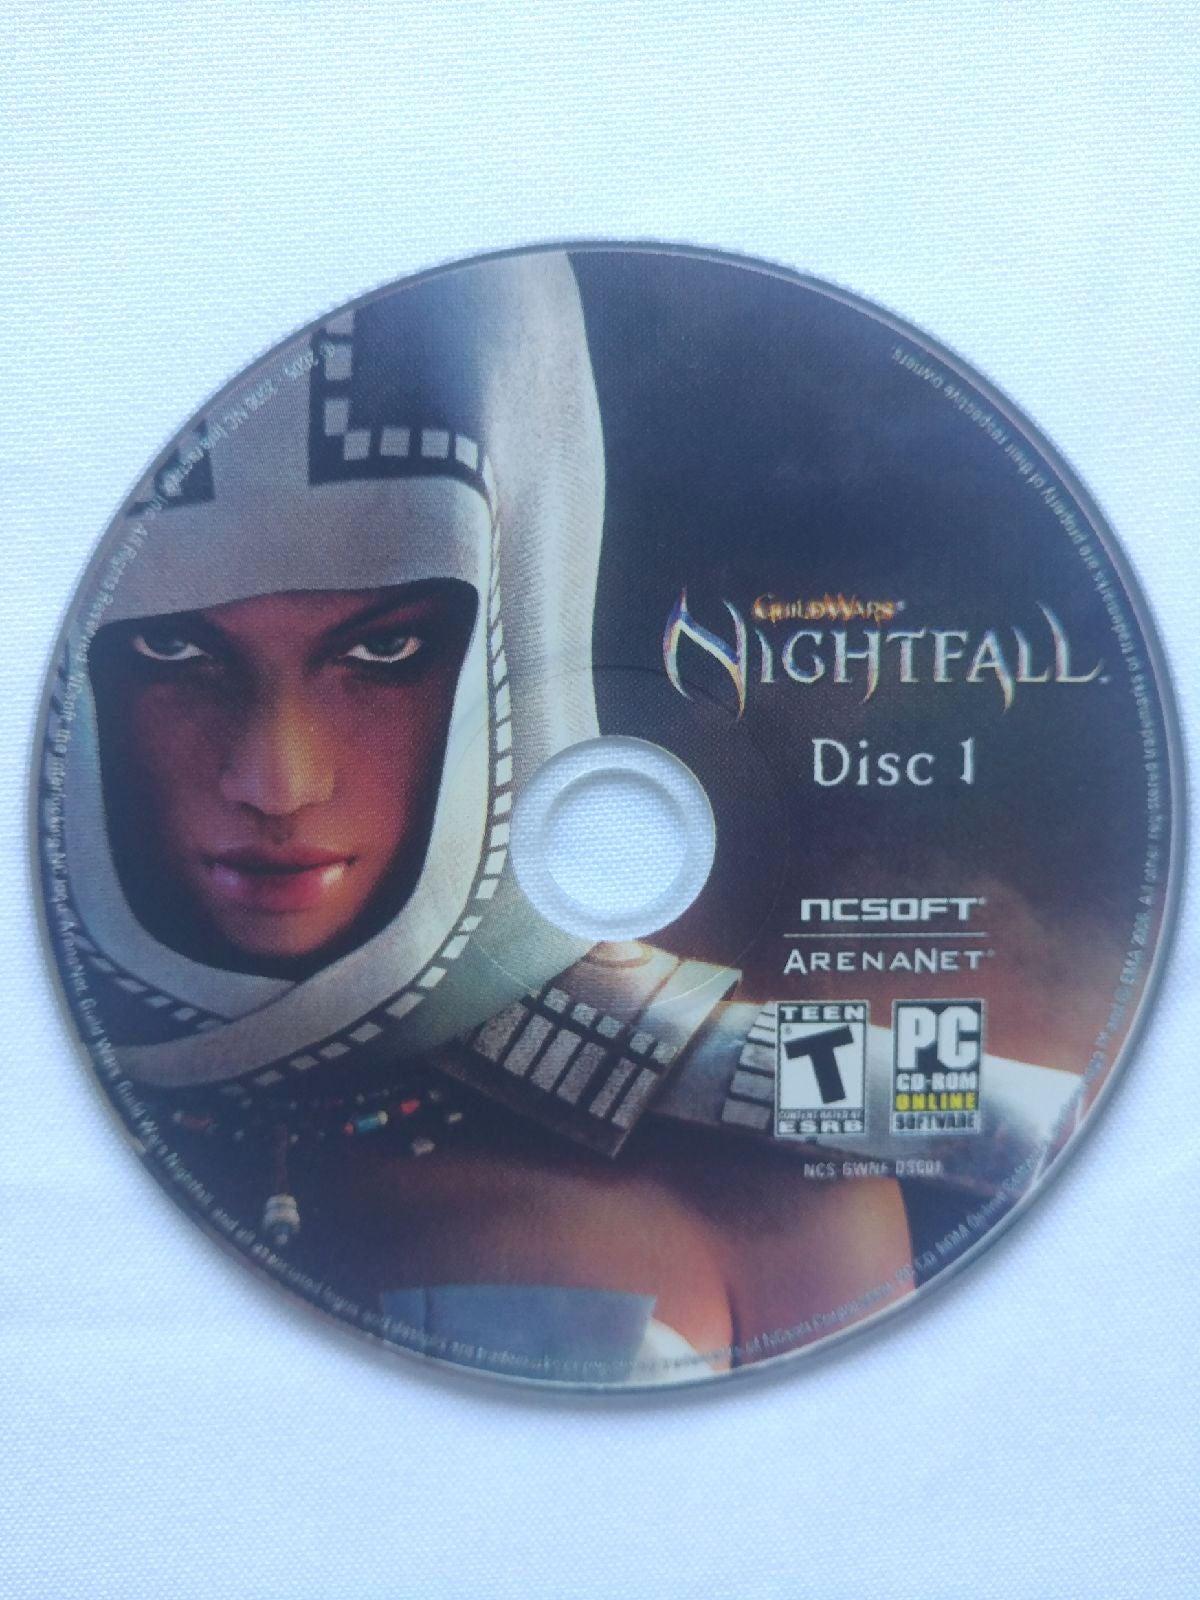 Night fall Guild Wars disc 1